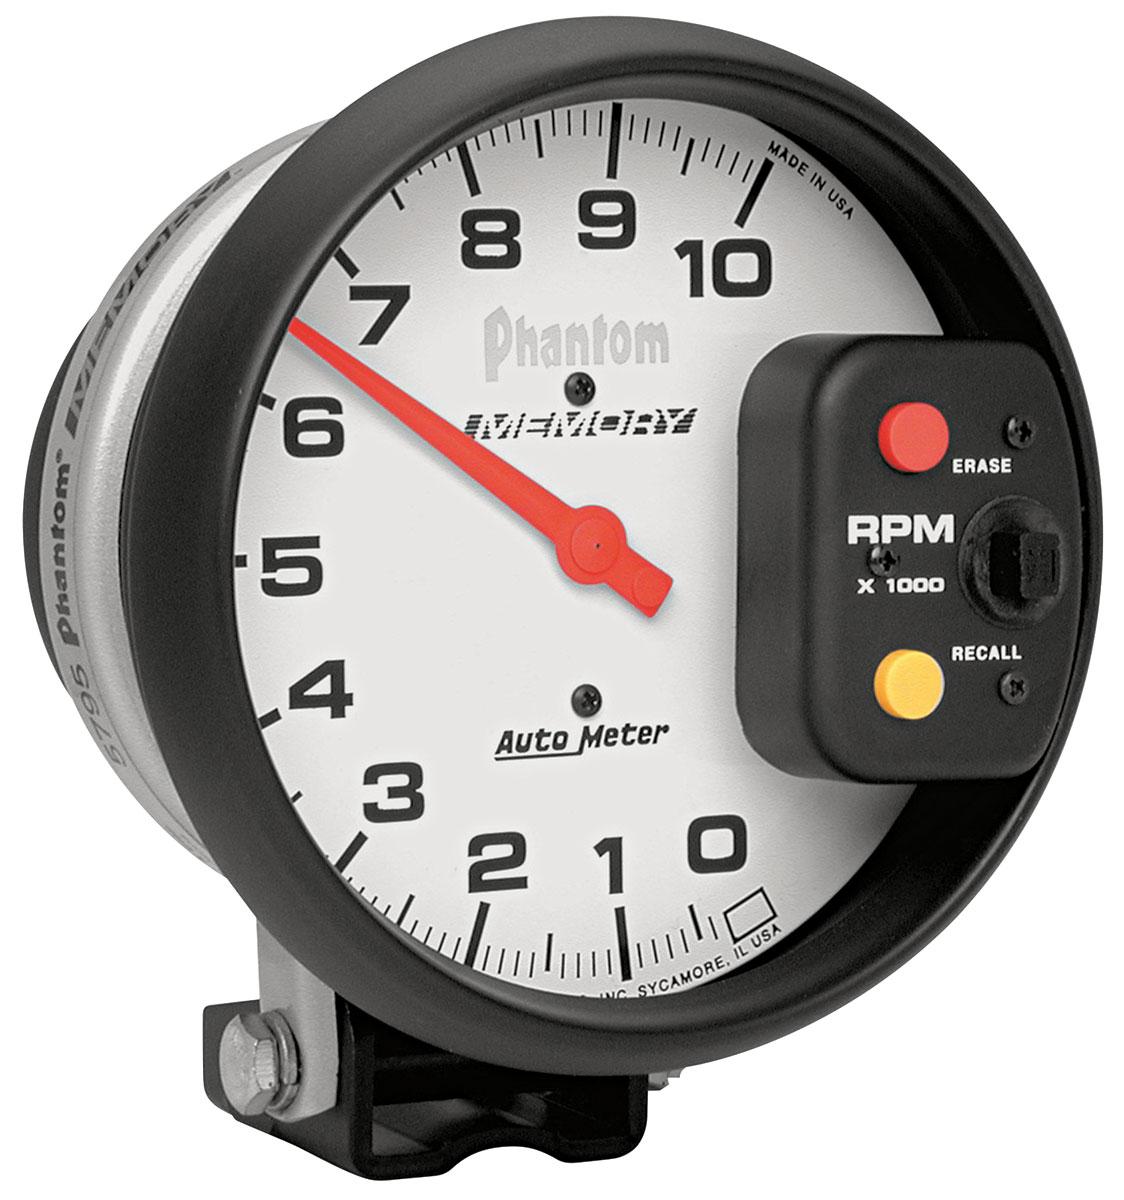 Gauge, Tachometer, Auto Meter, Phantom, 5